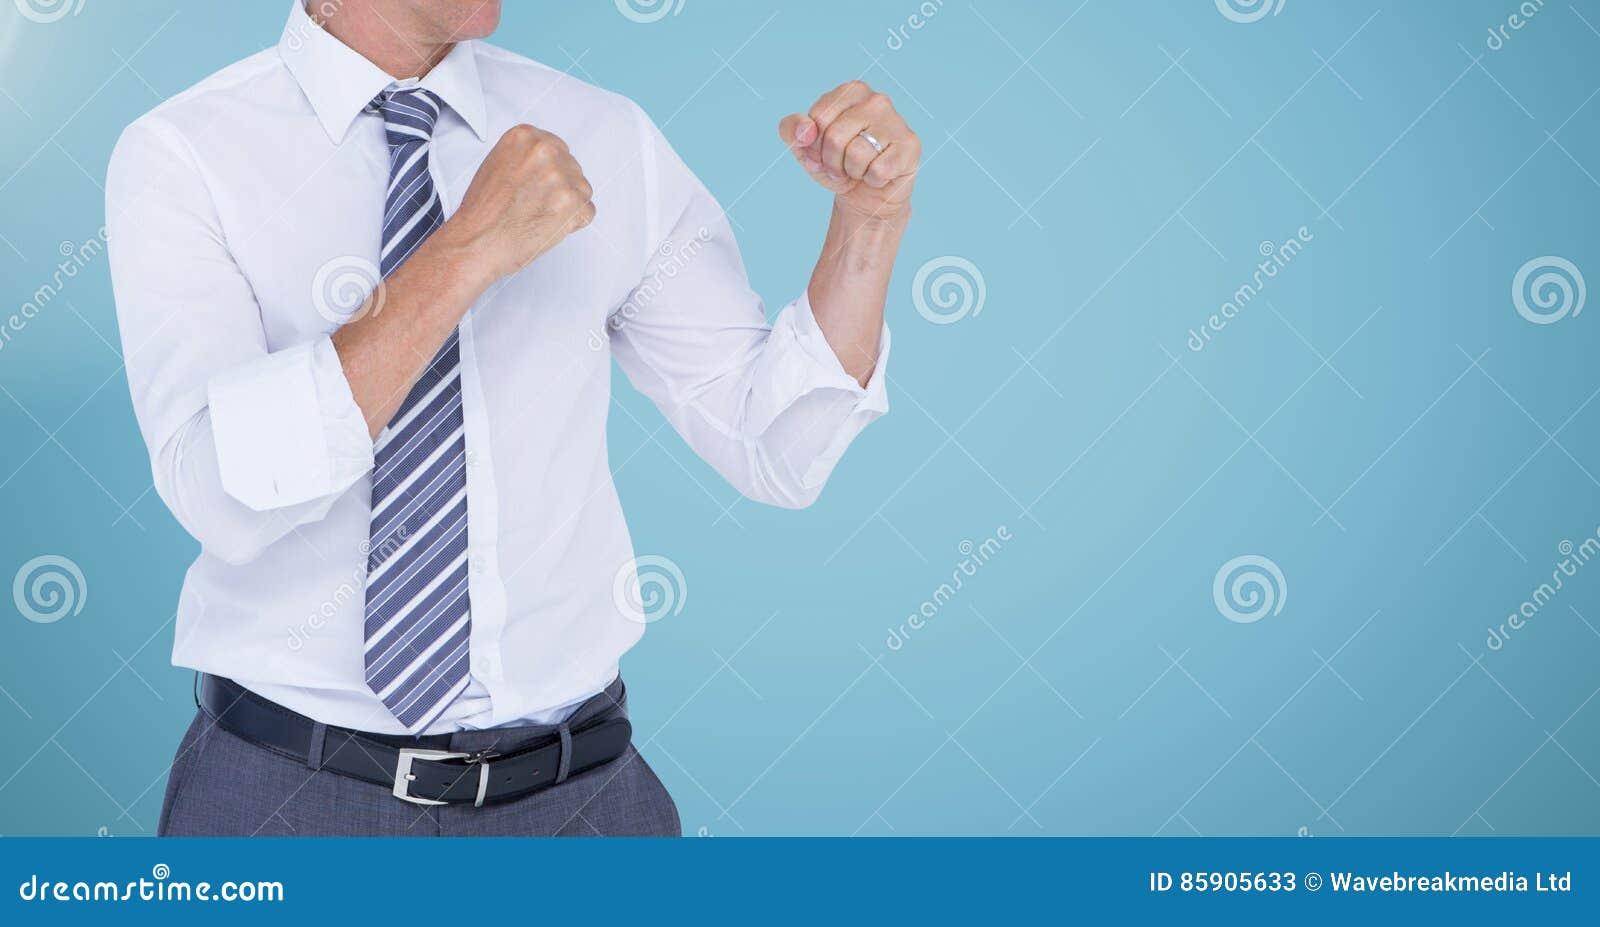 Businessman Torso with combative posture against neutral blue background